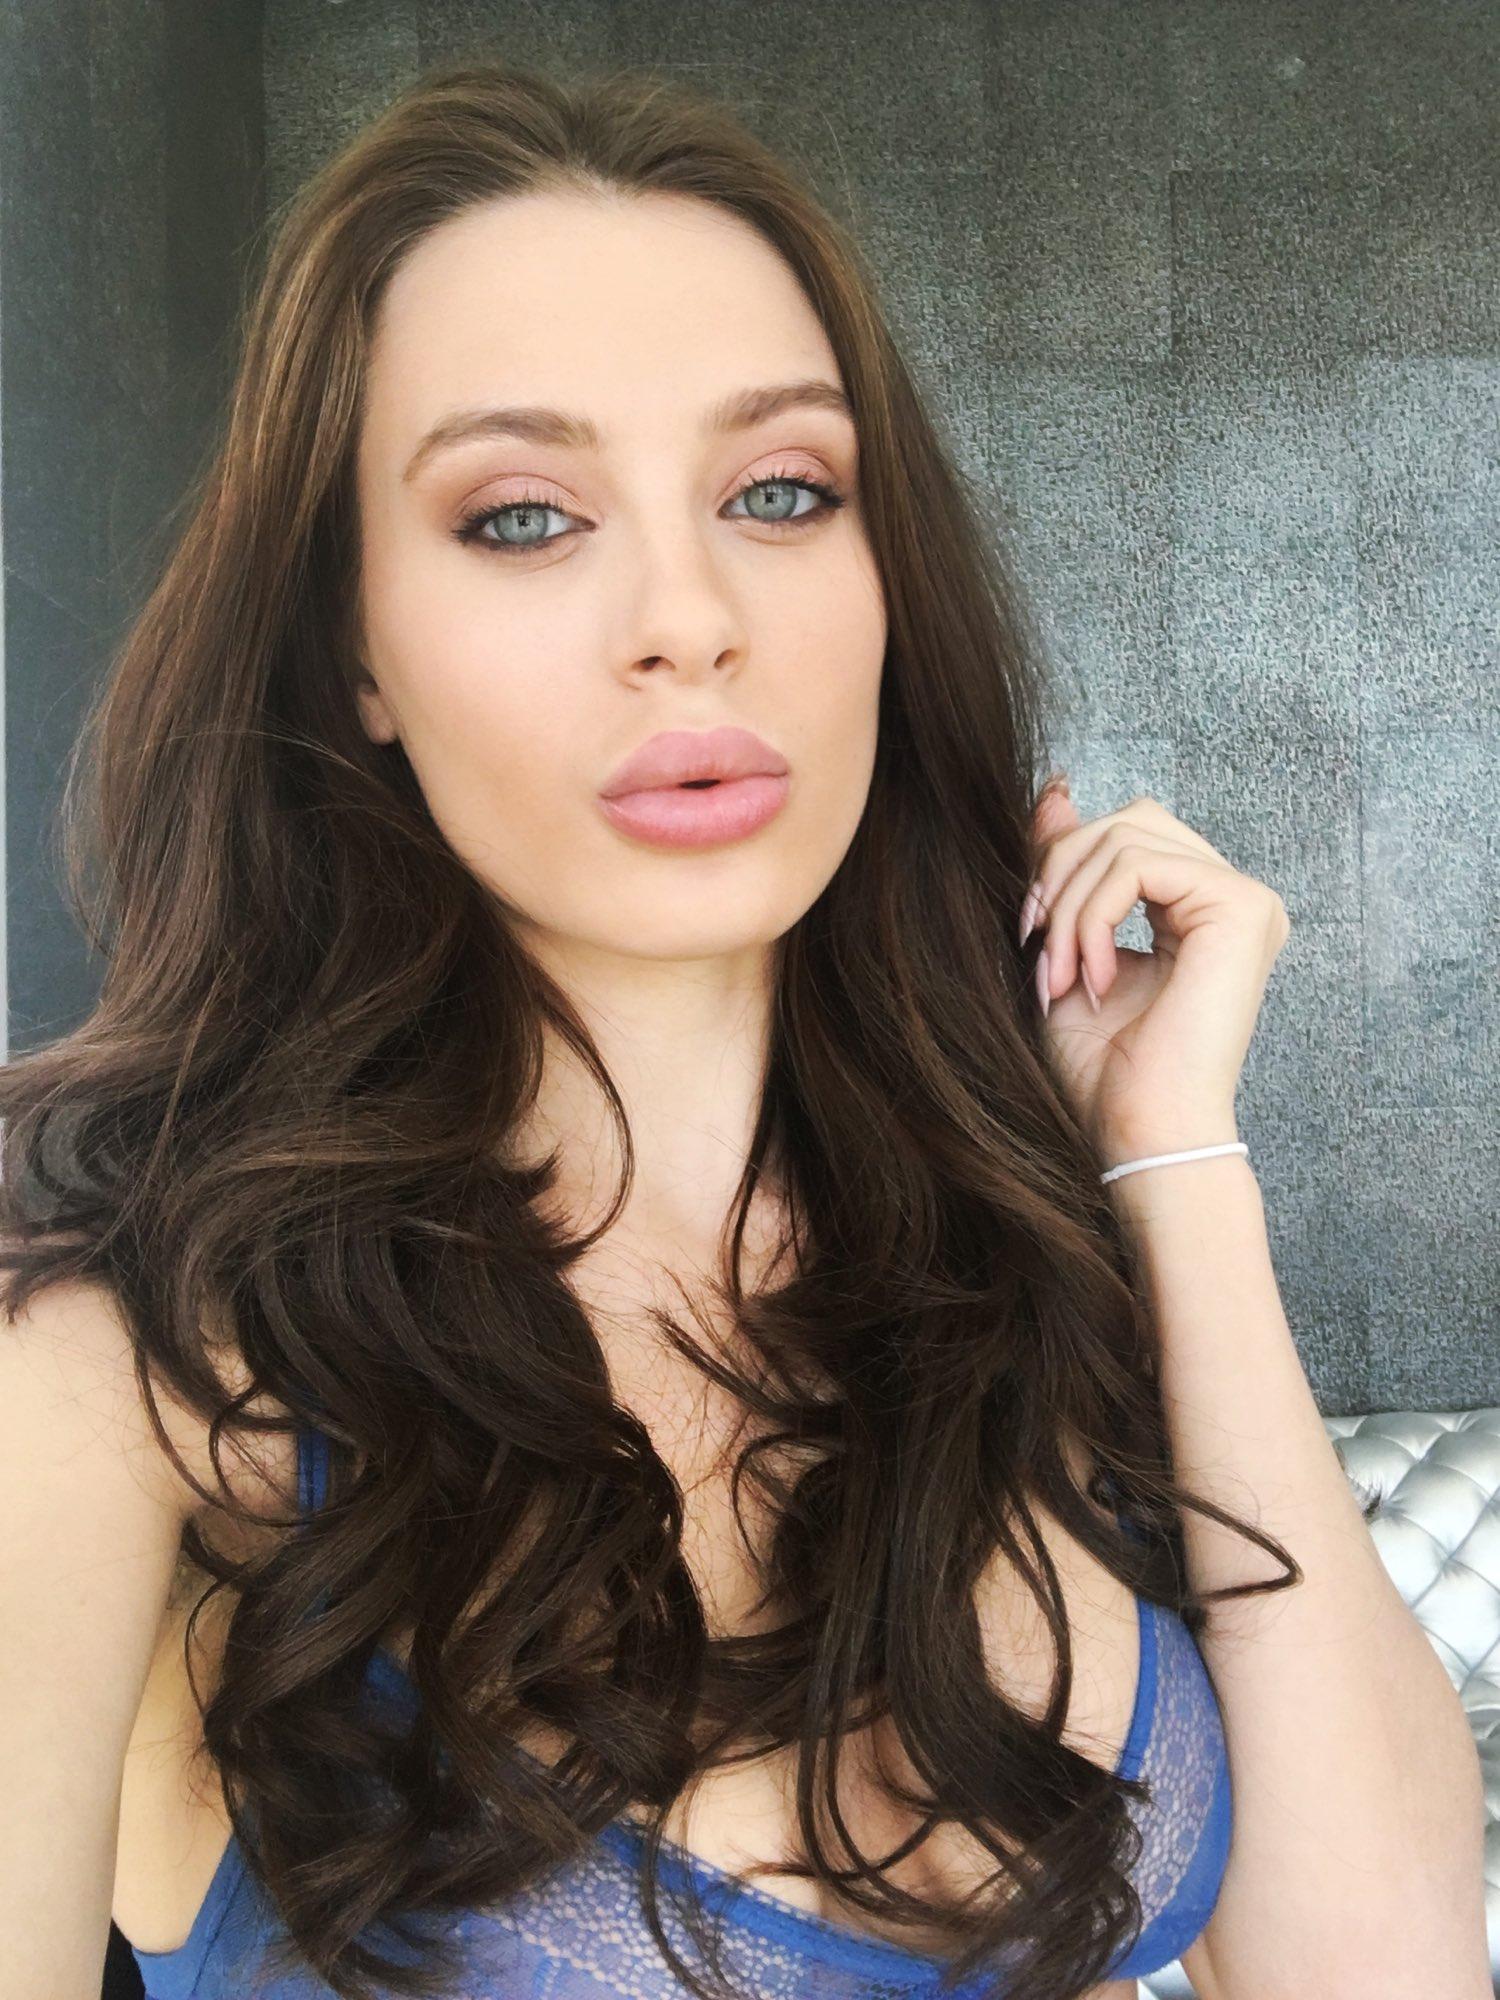 Lana rhoades 19 years old